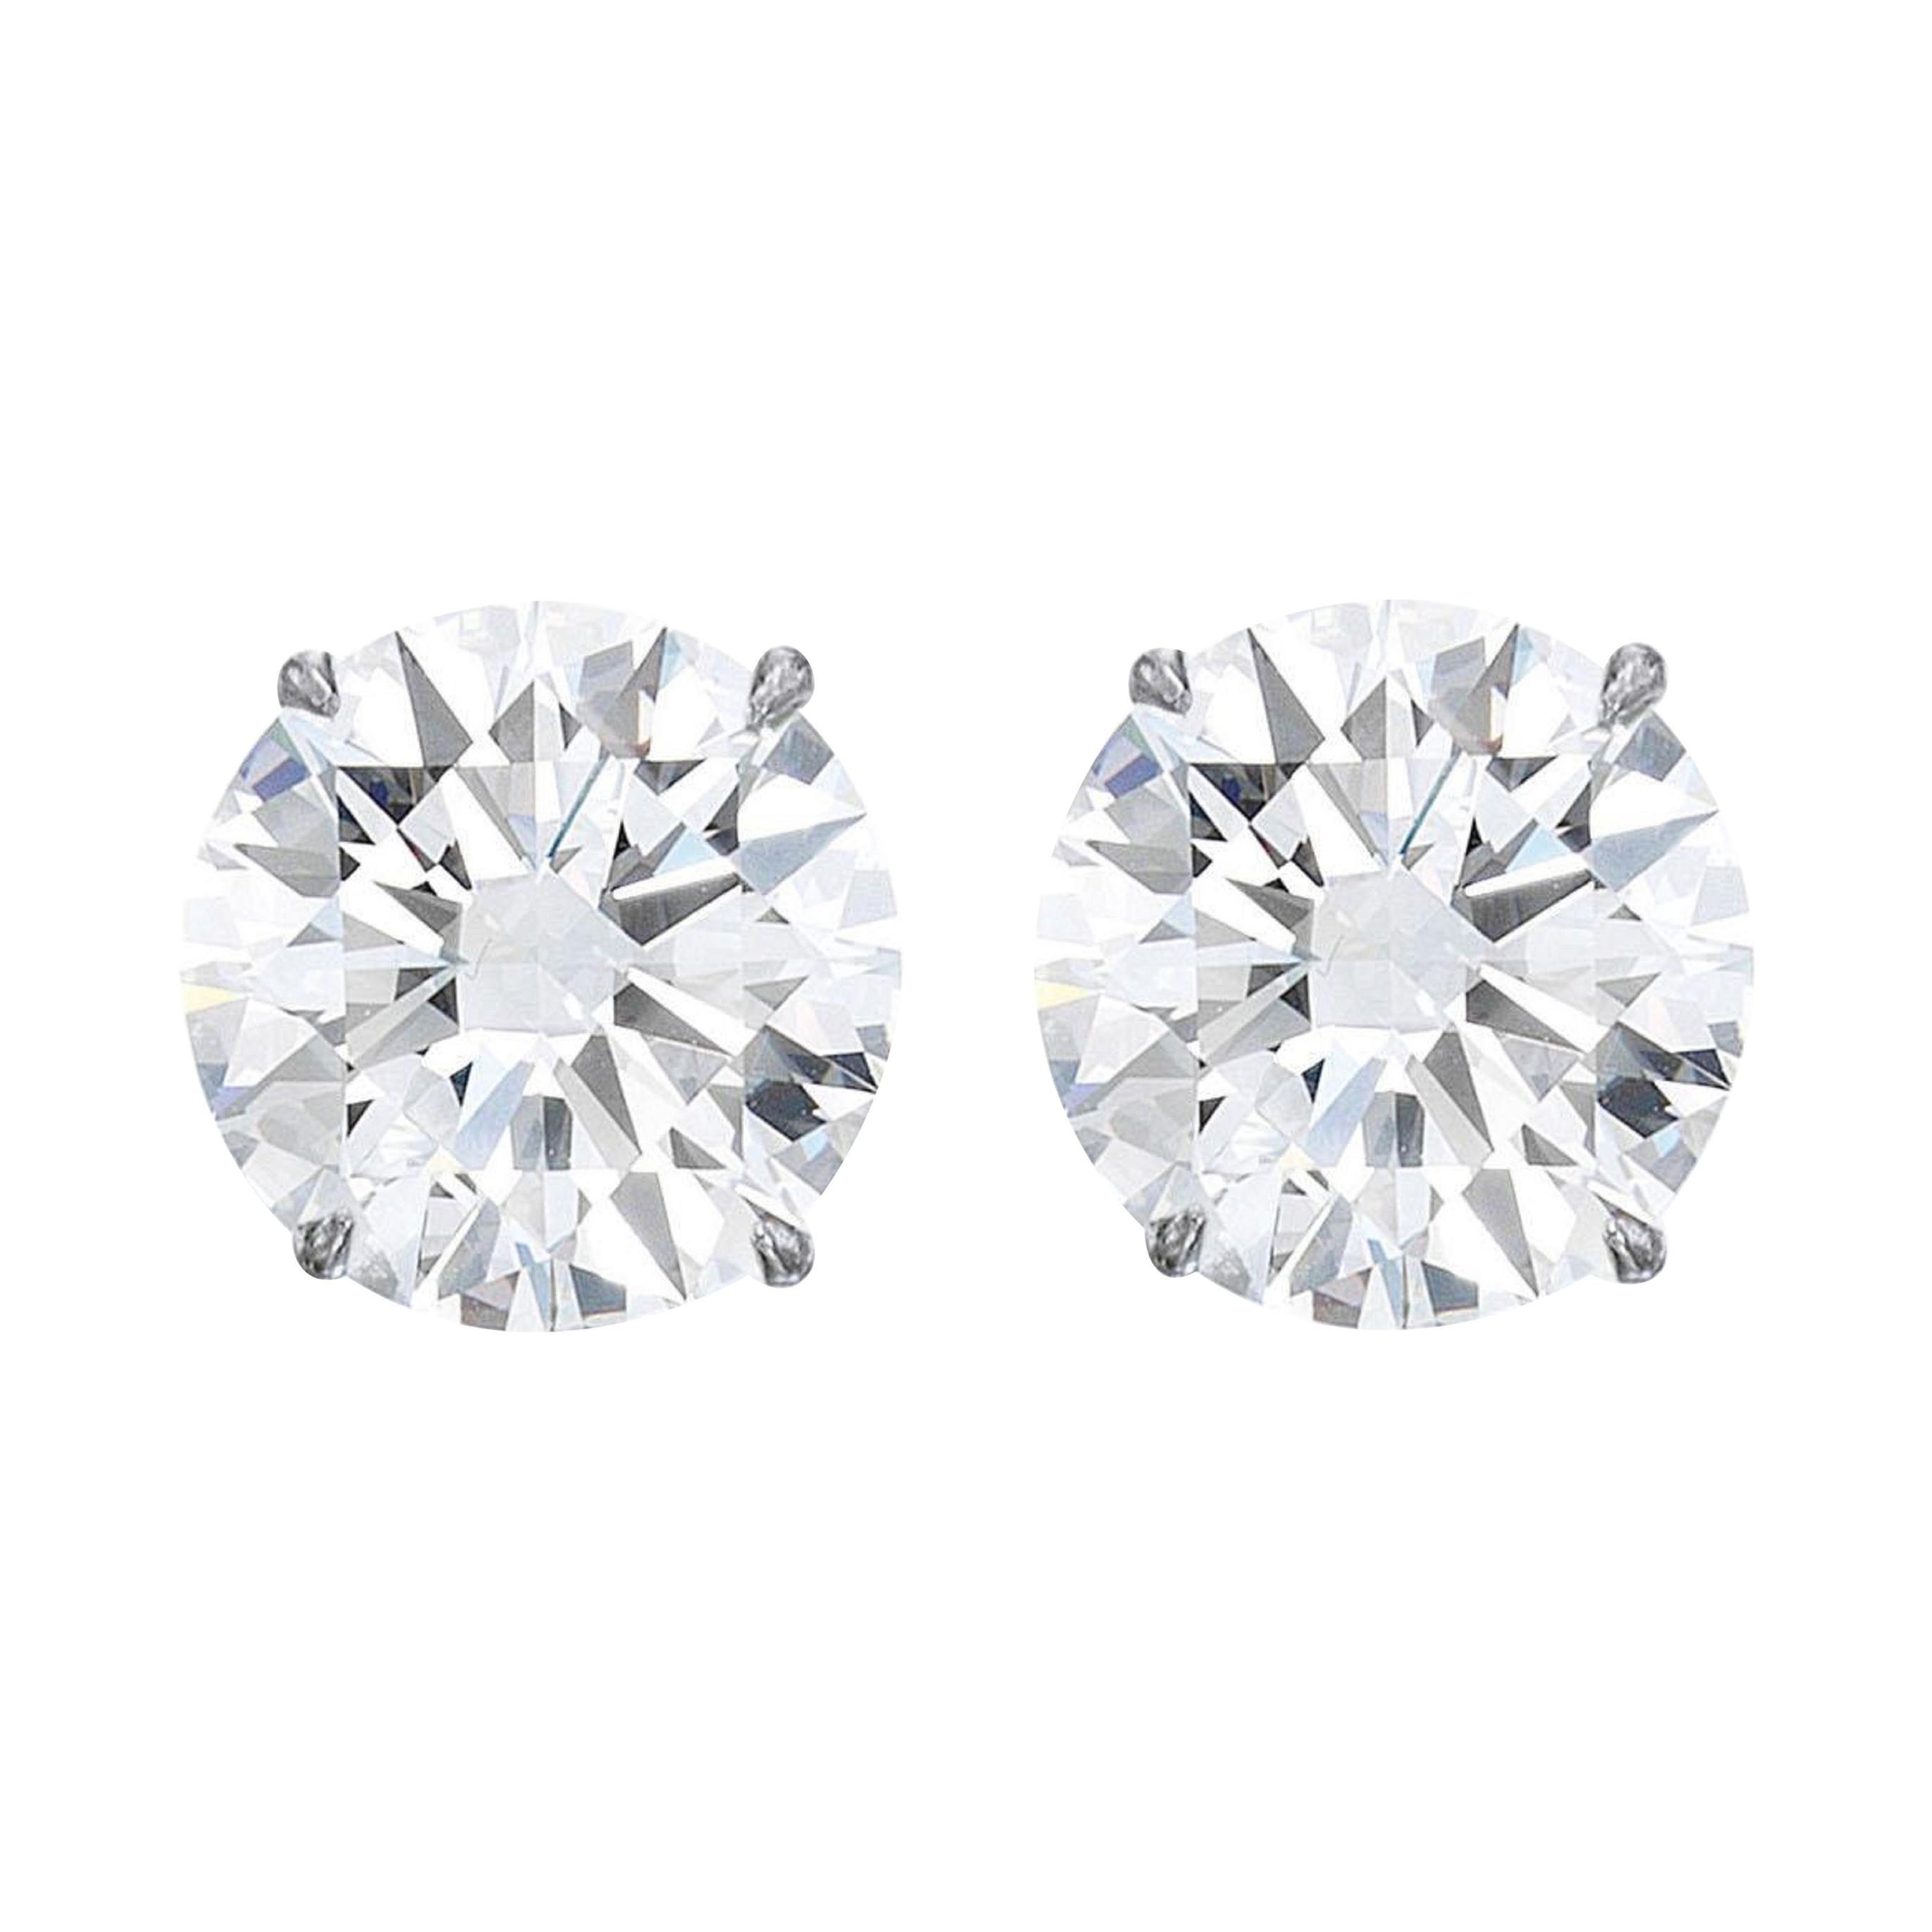 GIA Certified 4 Carat Round Brilliant Cut Diamond Studs